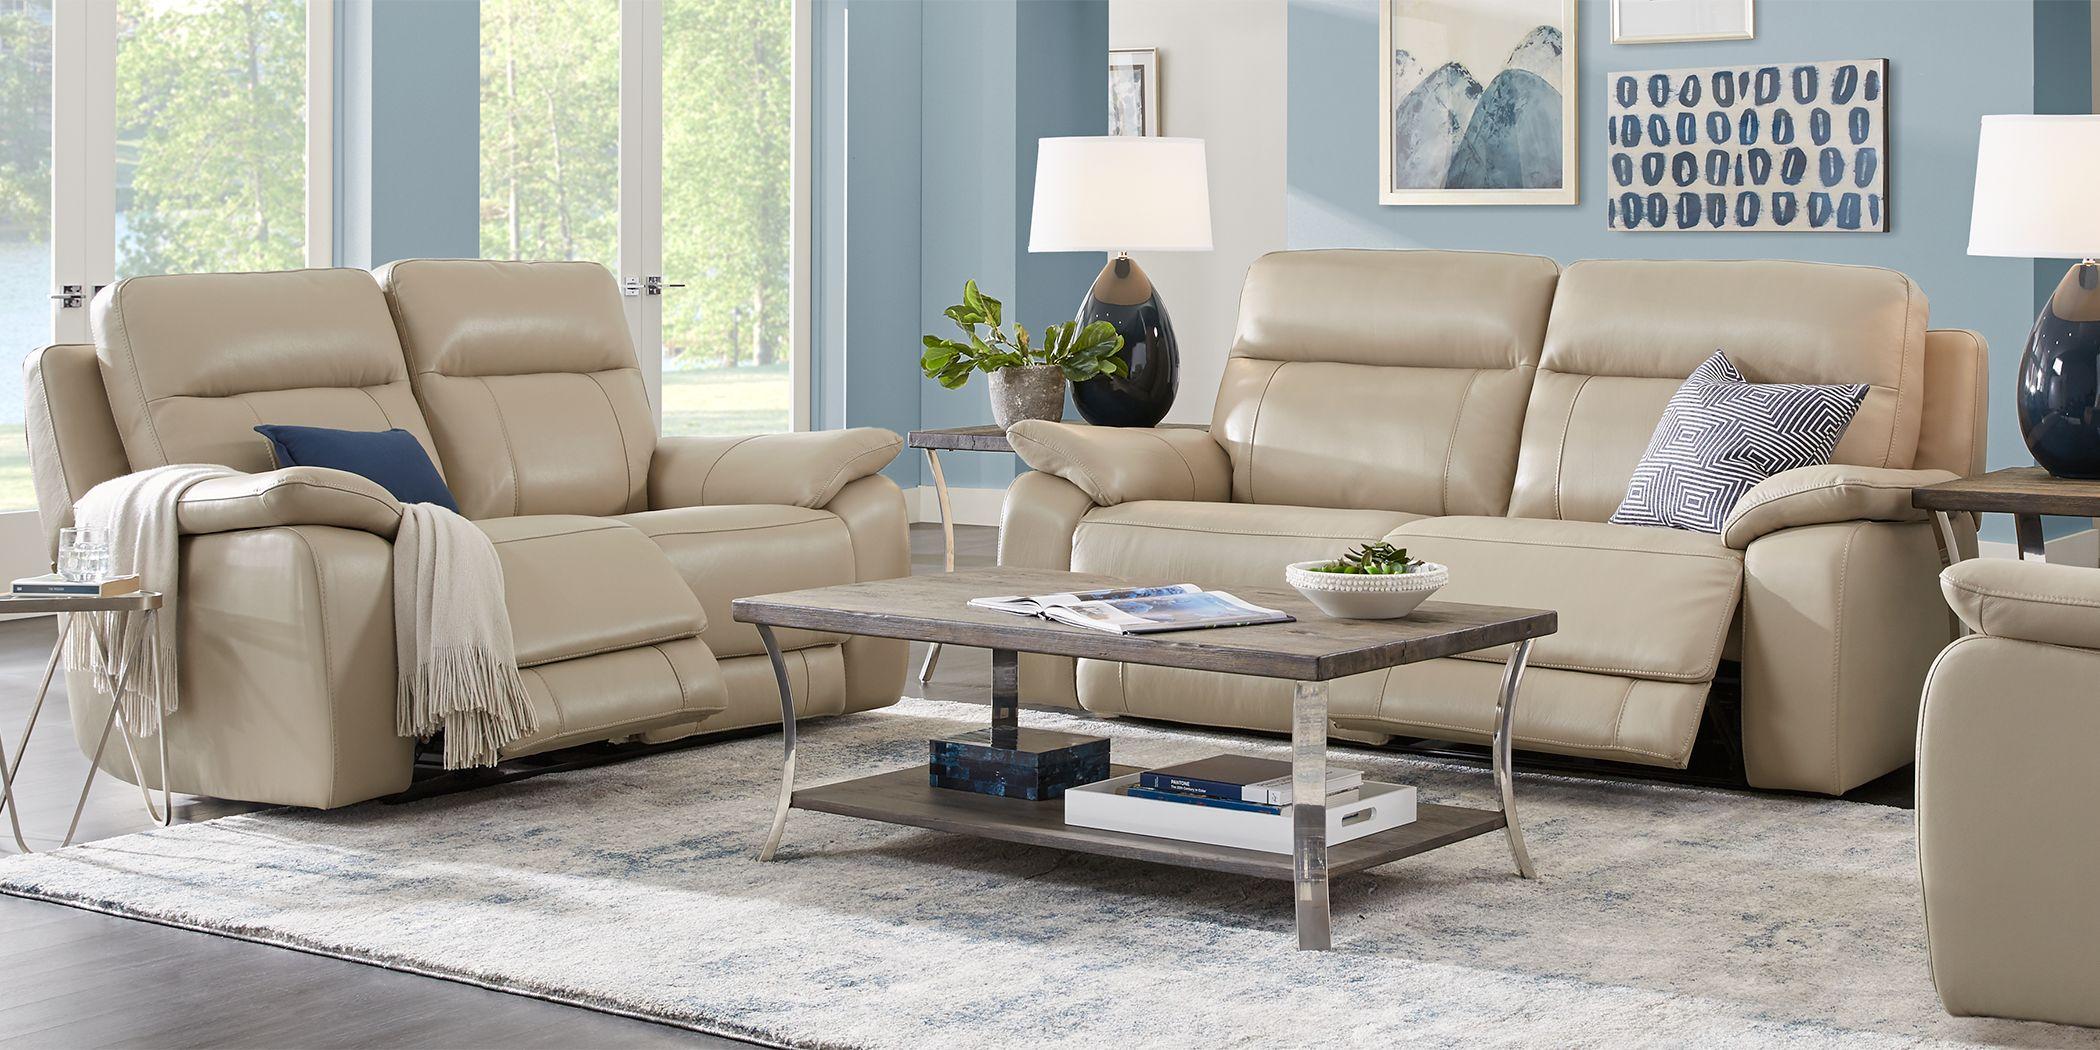 Torini Cream Leather 3 Pc Reclining Living Room